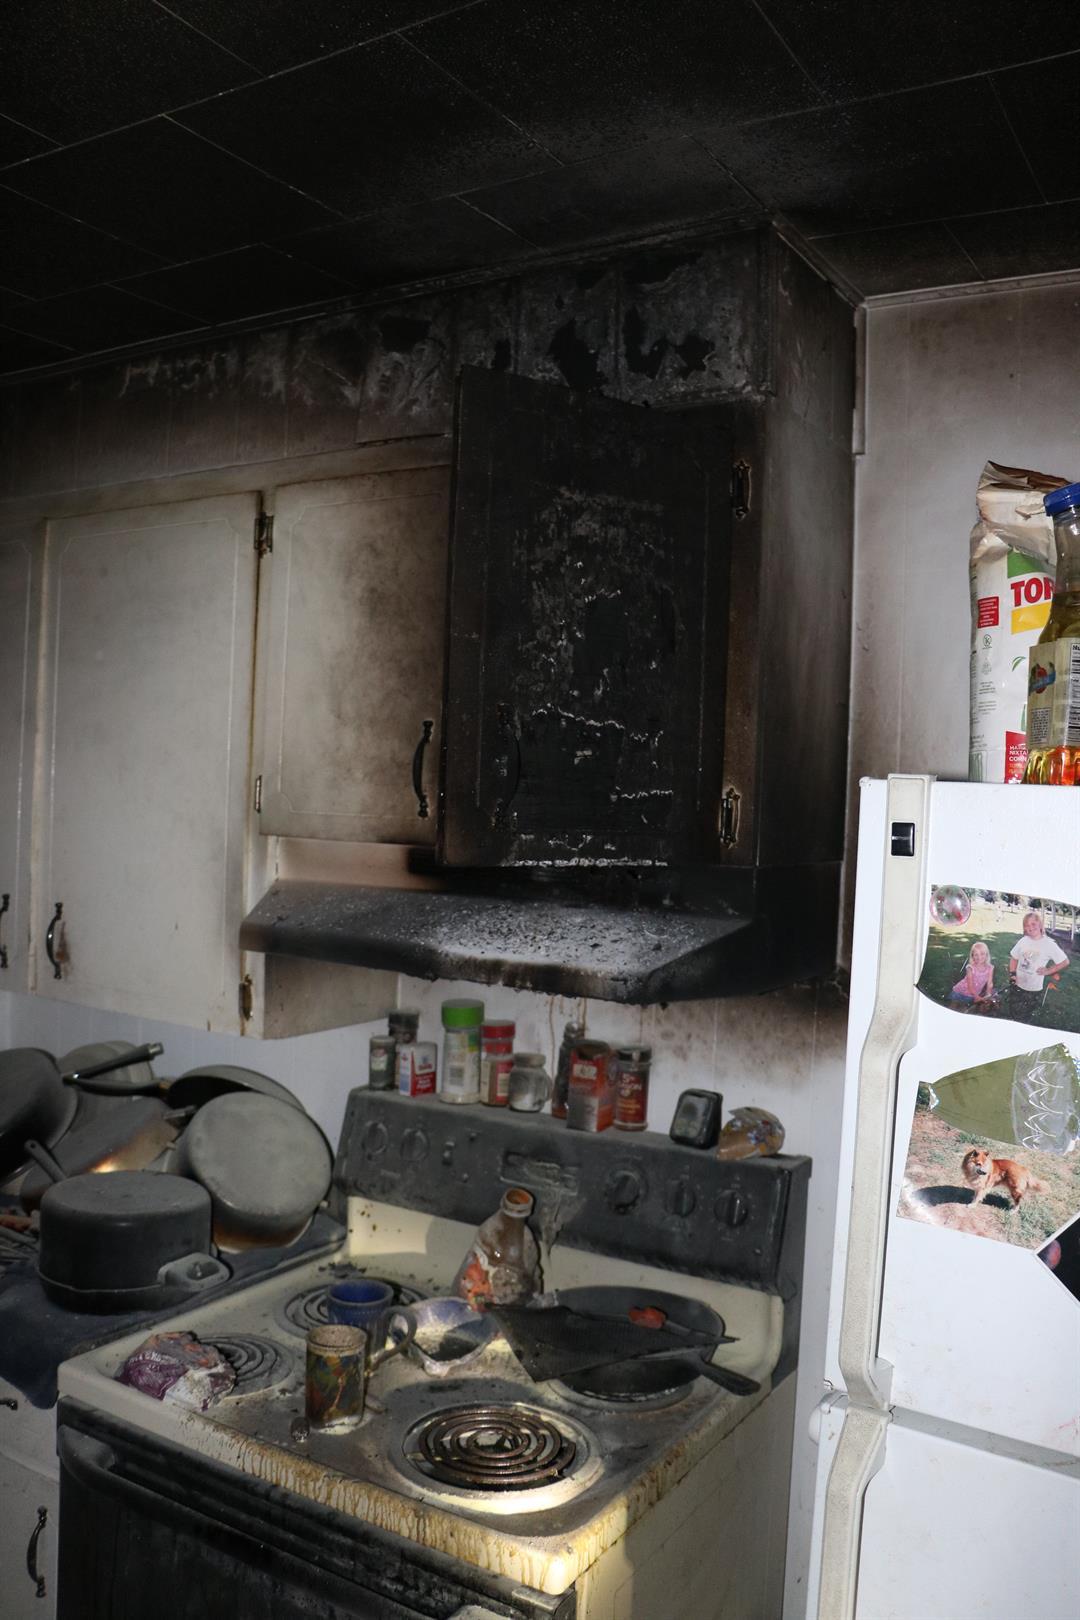 Courtesy: Lebanon Fire District